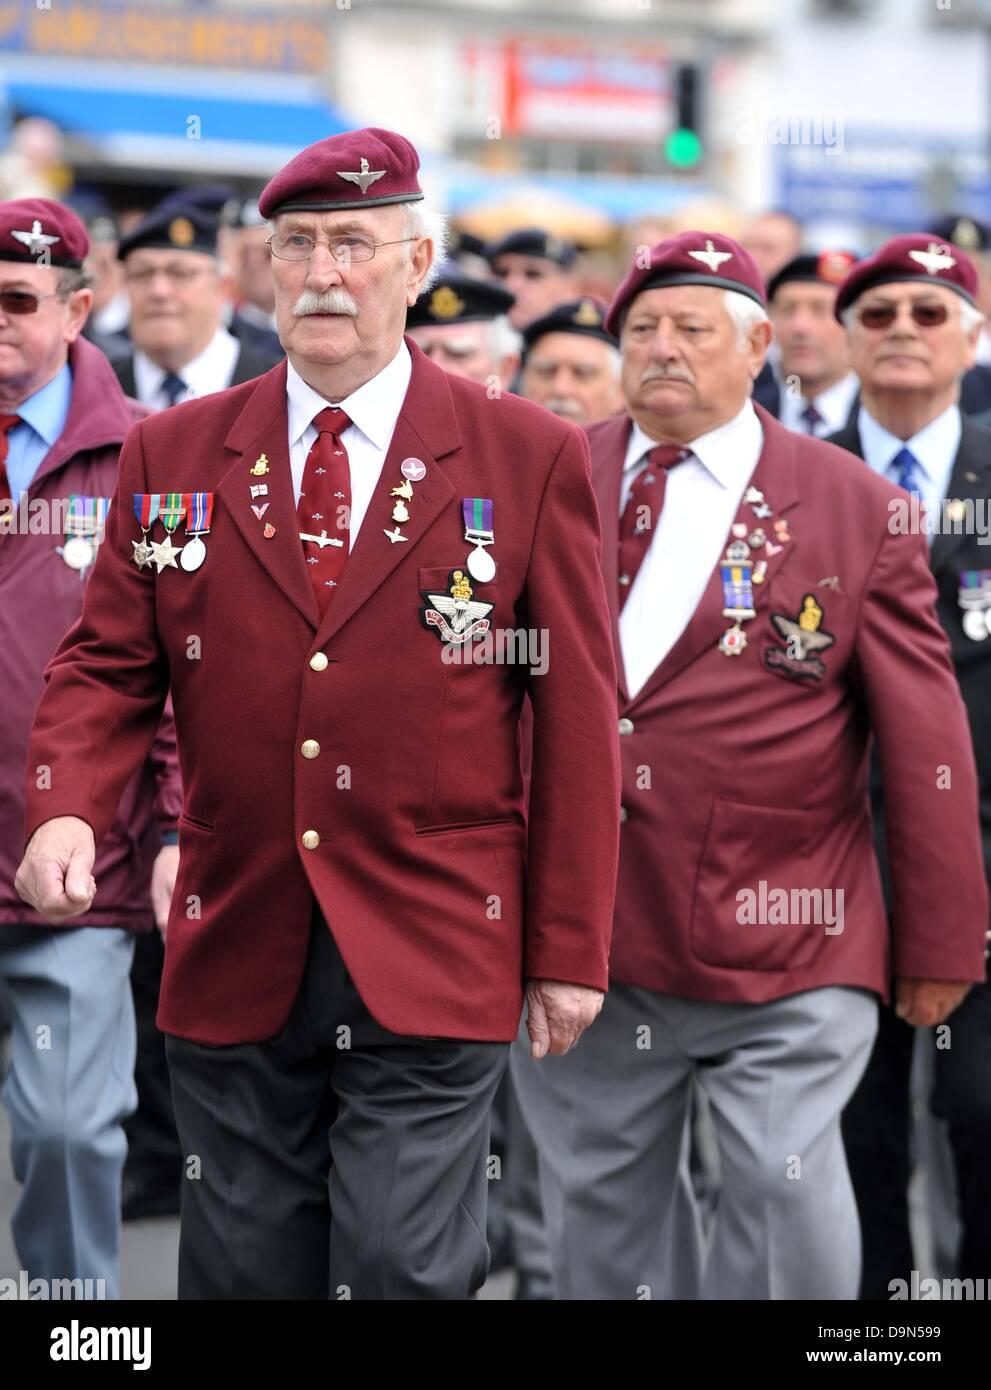 World War II veterans parade - Stock Image